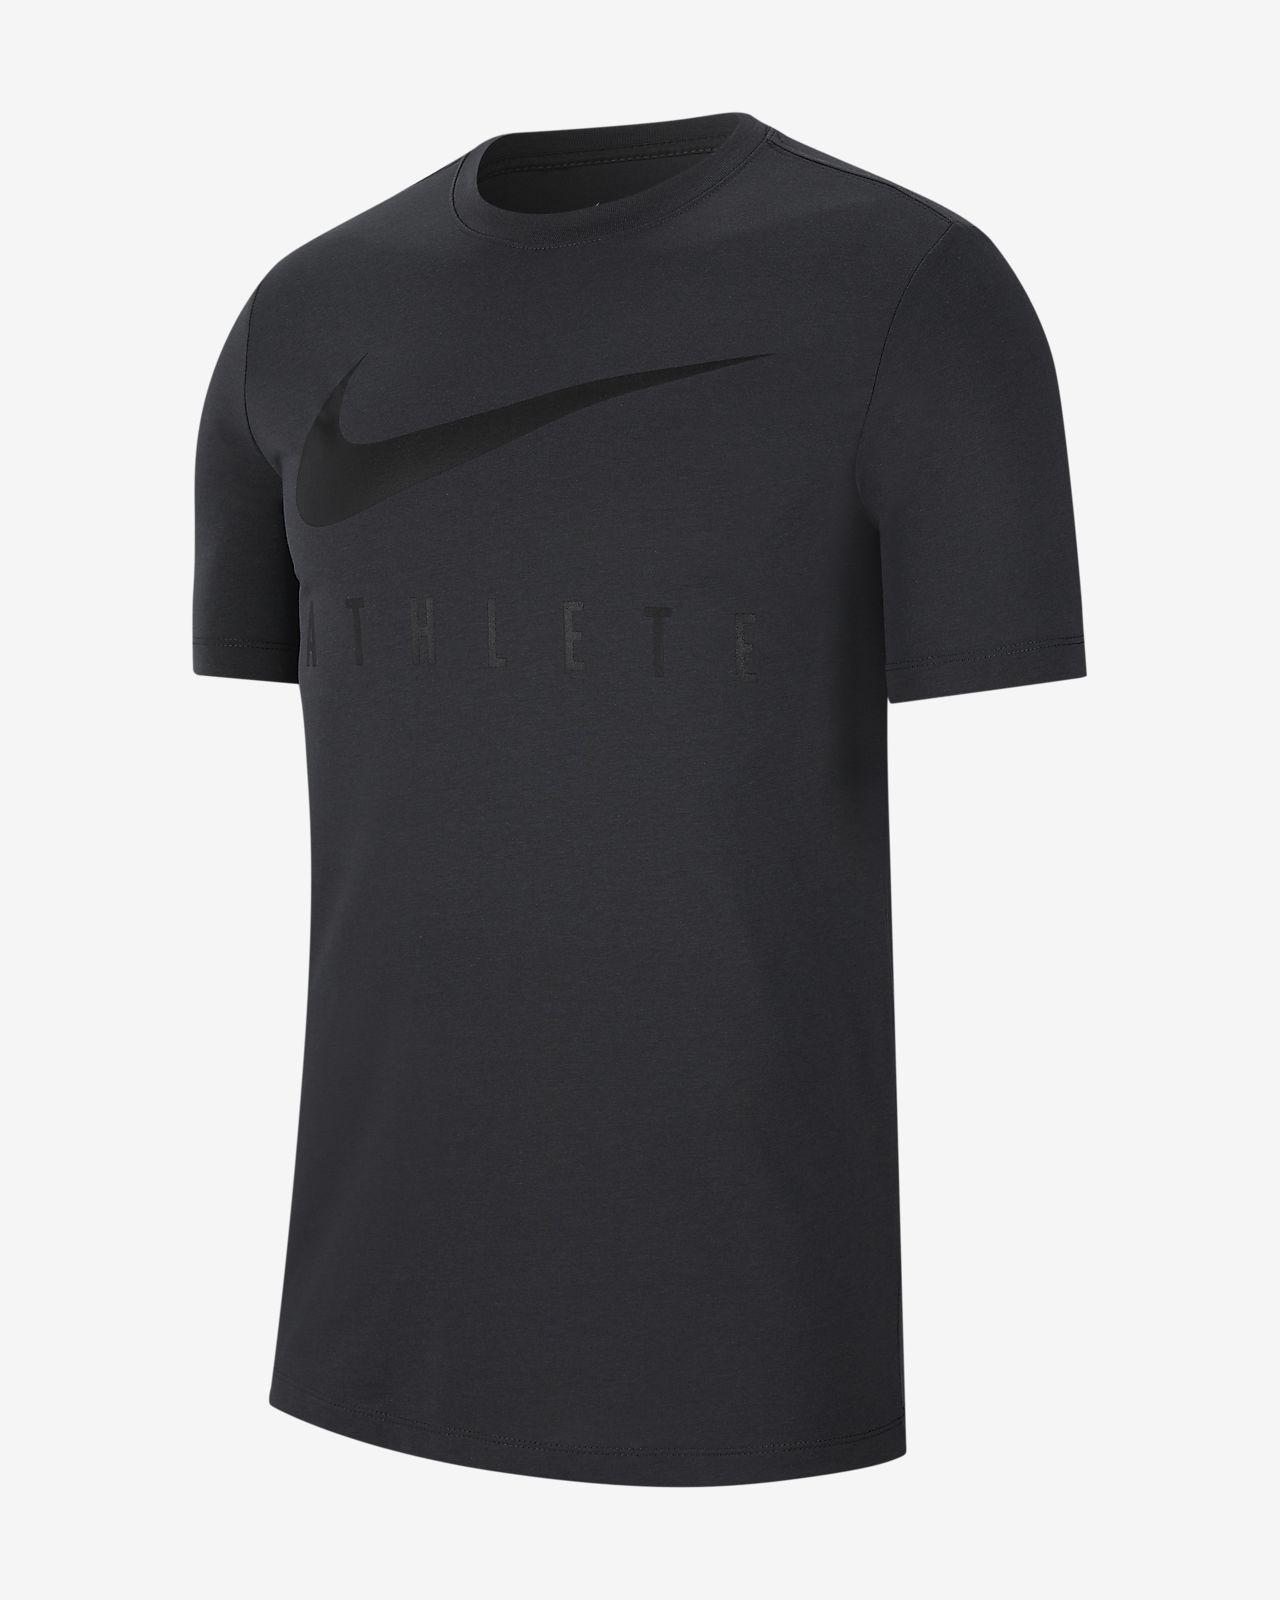 Nike Dri FIT Trainings T Shirt für Herren